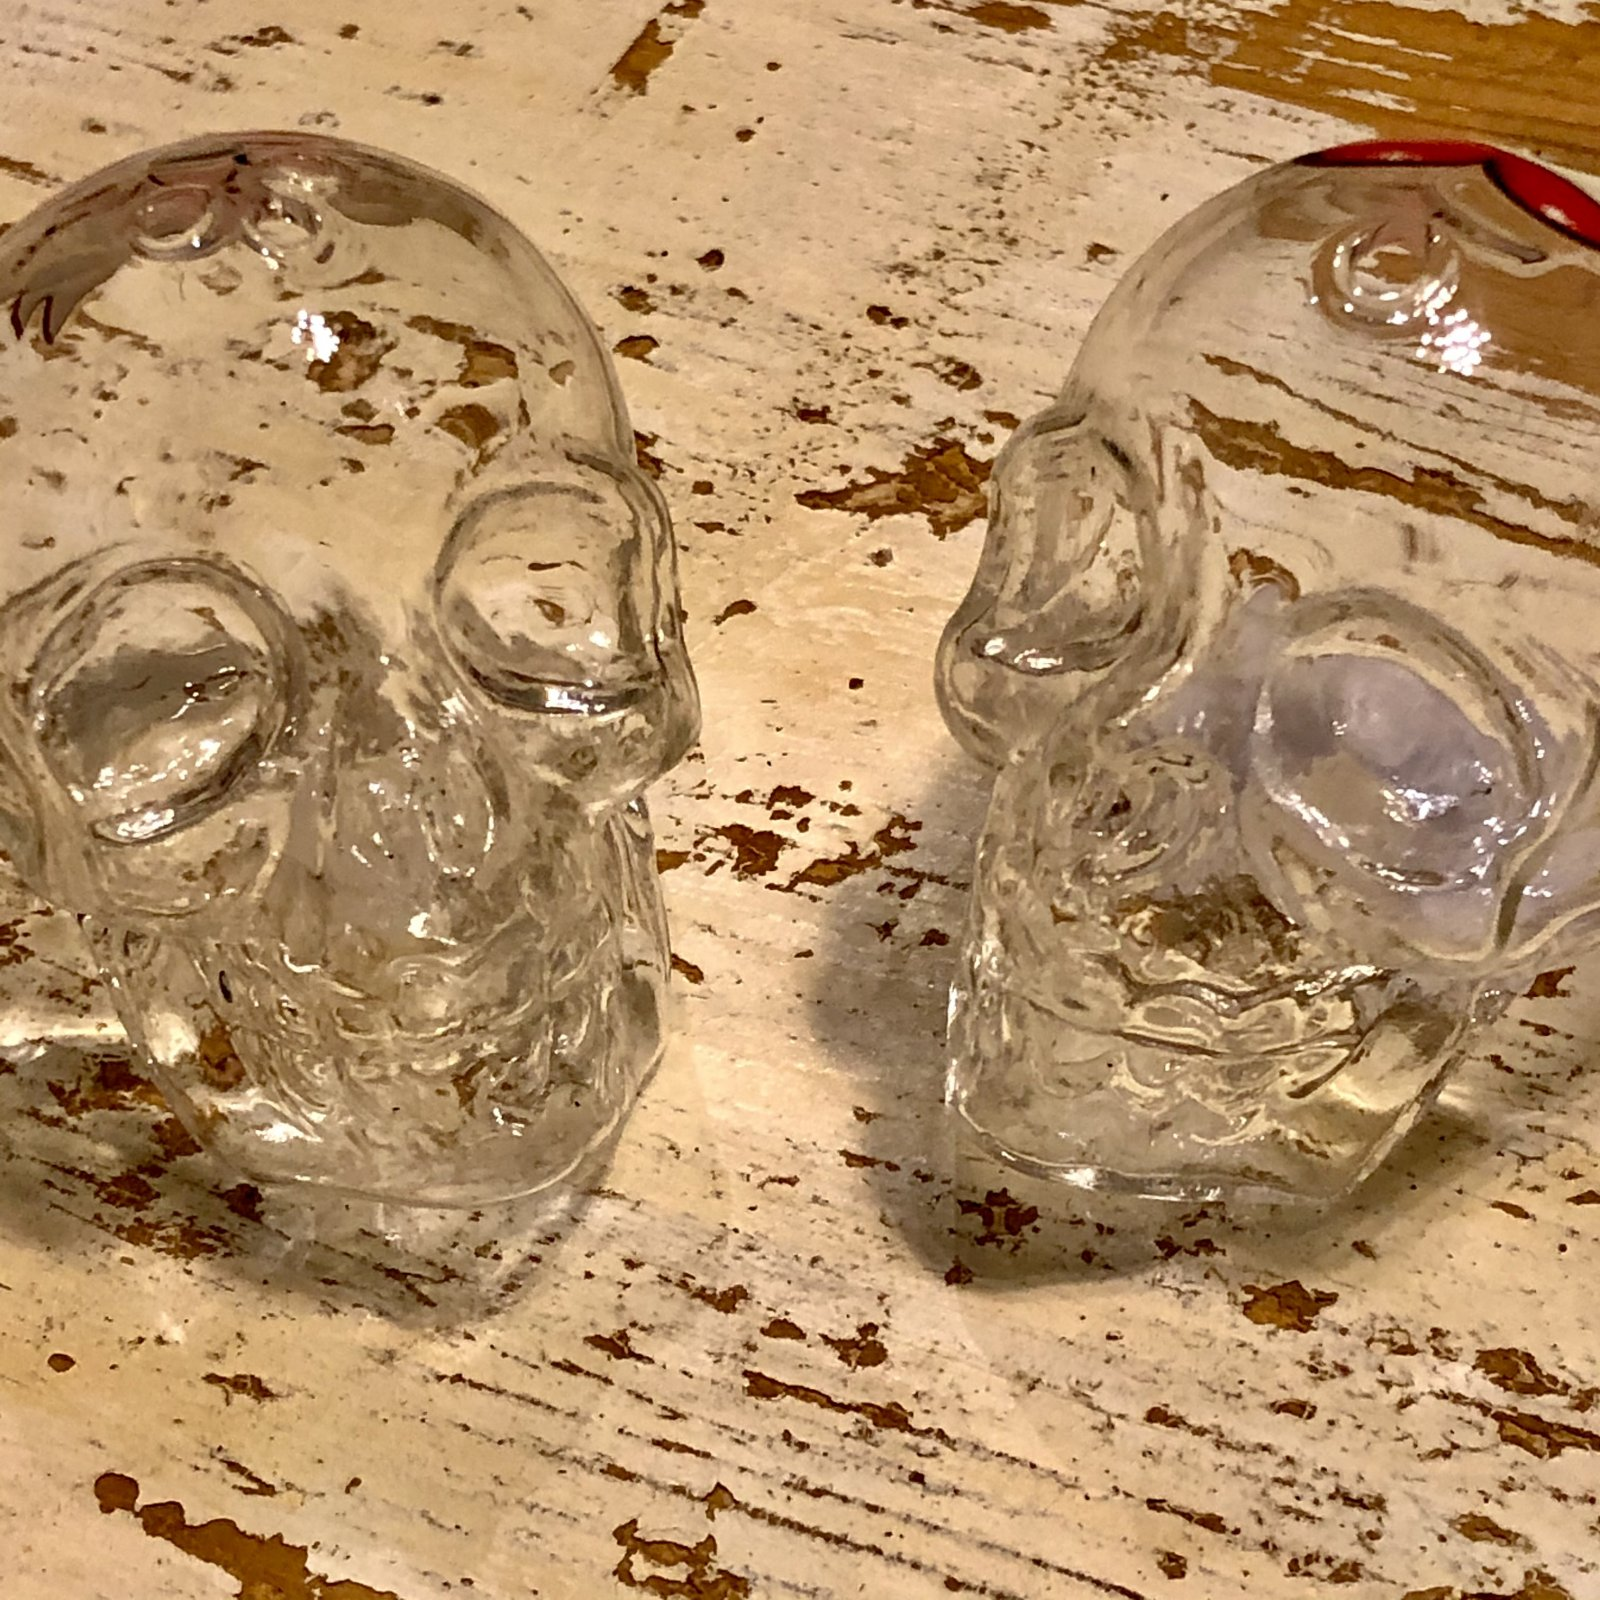 Crystal True Love Skull Salt and Pepper